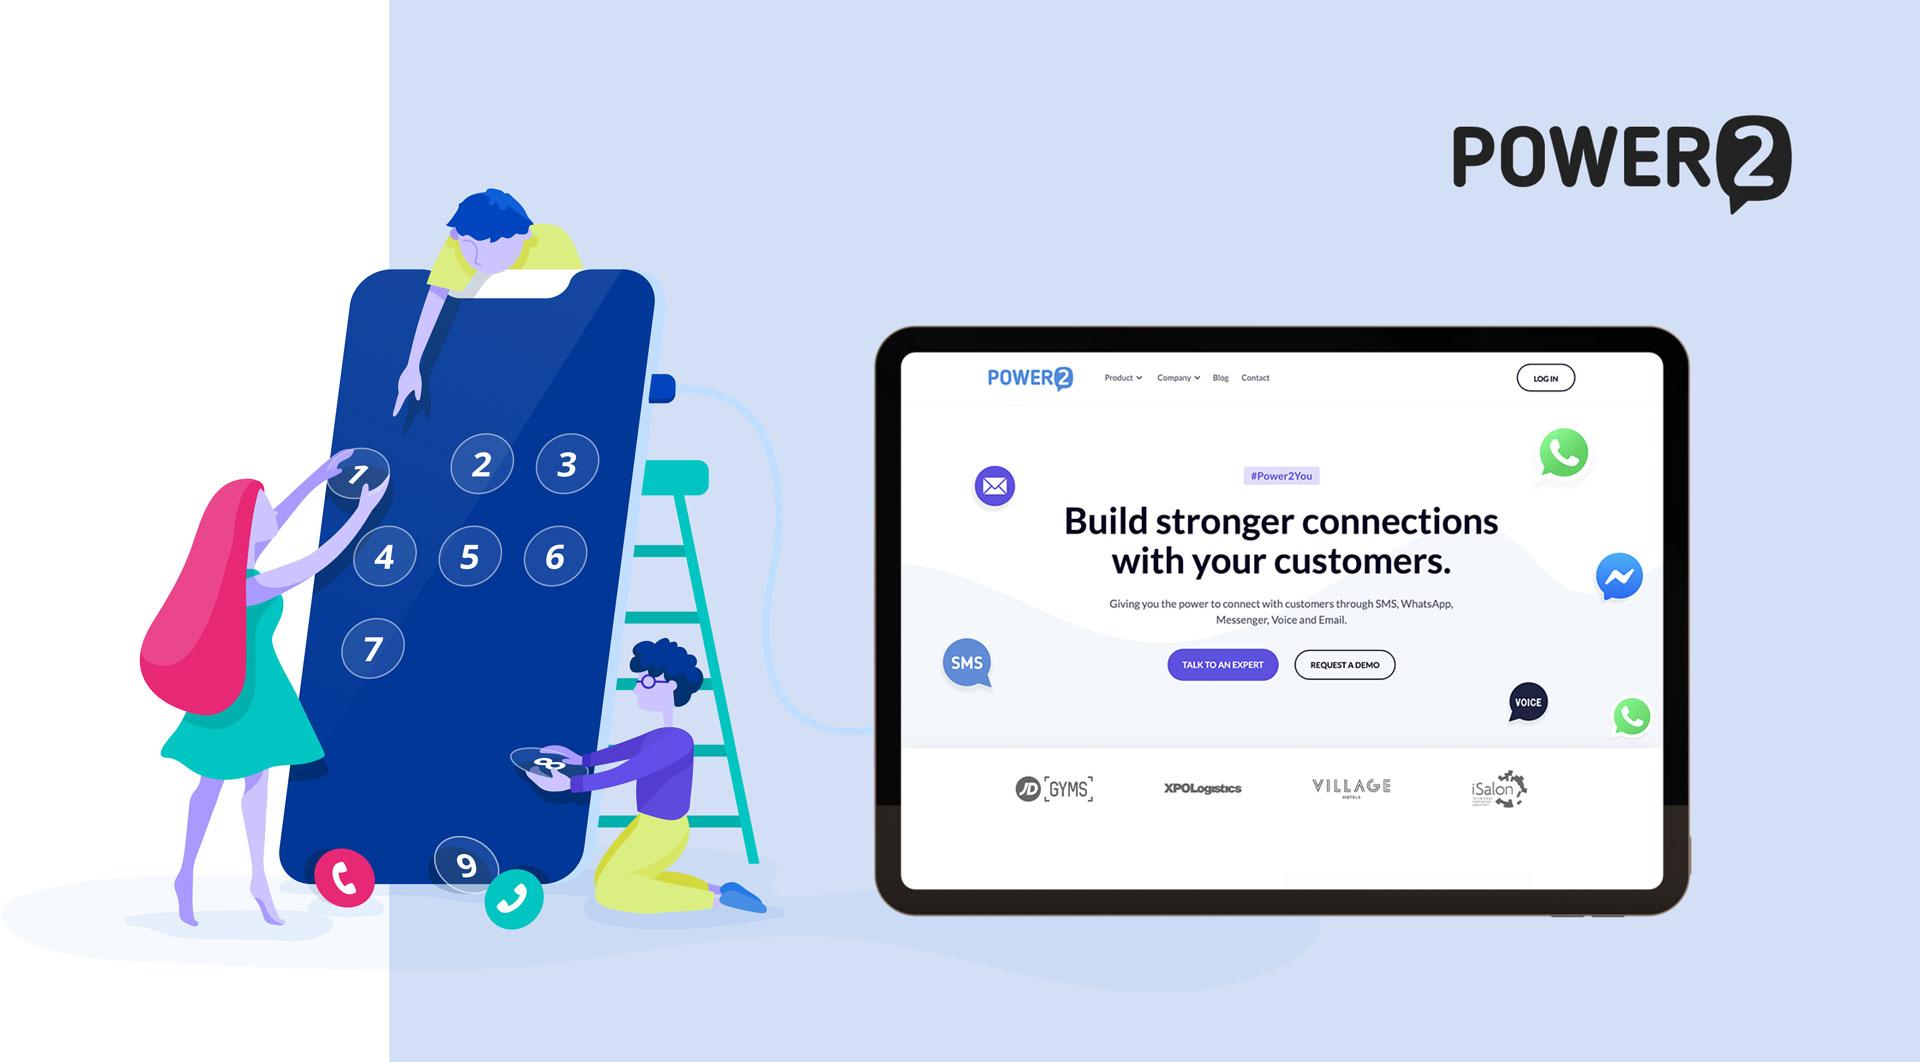 SMS platform for Power2